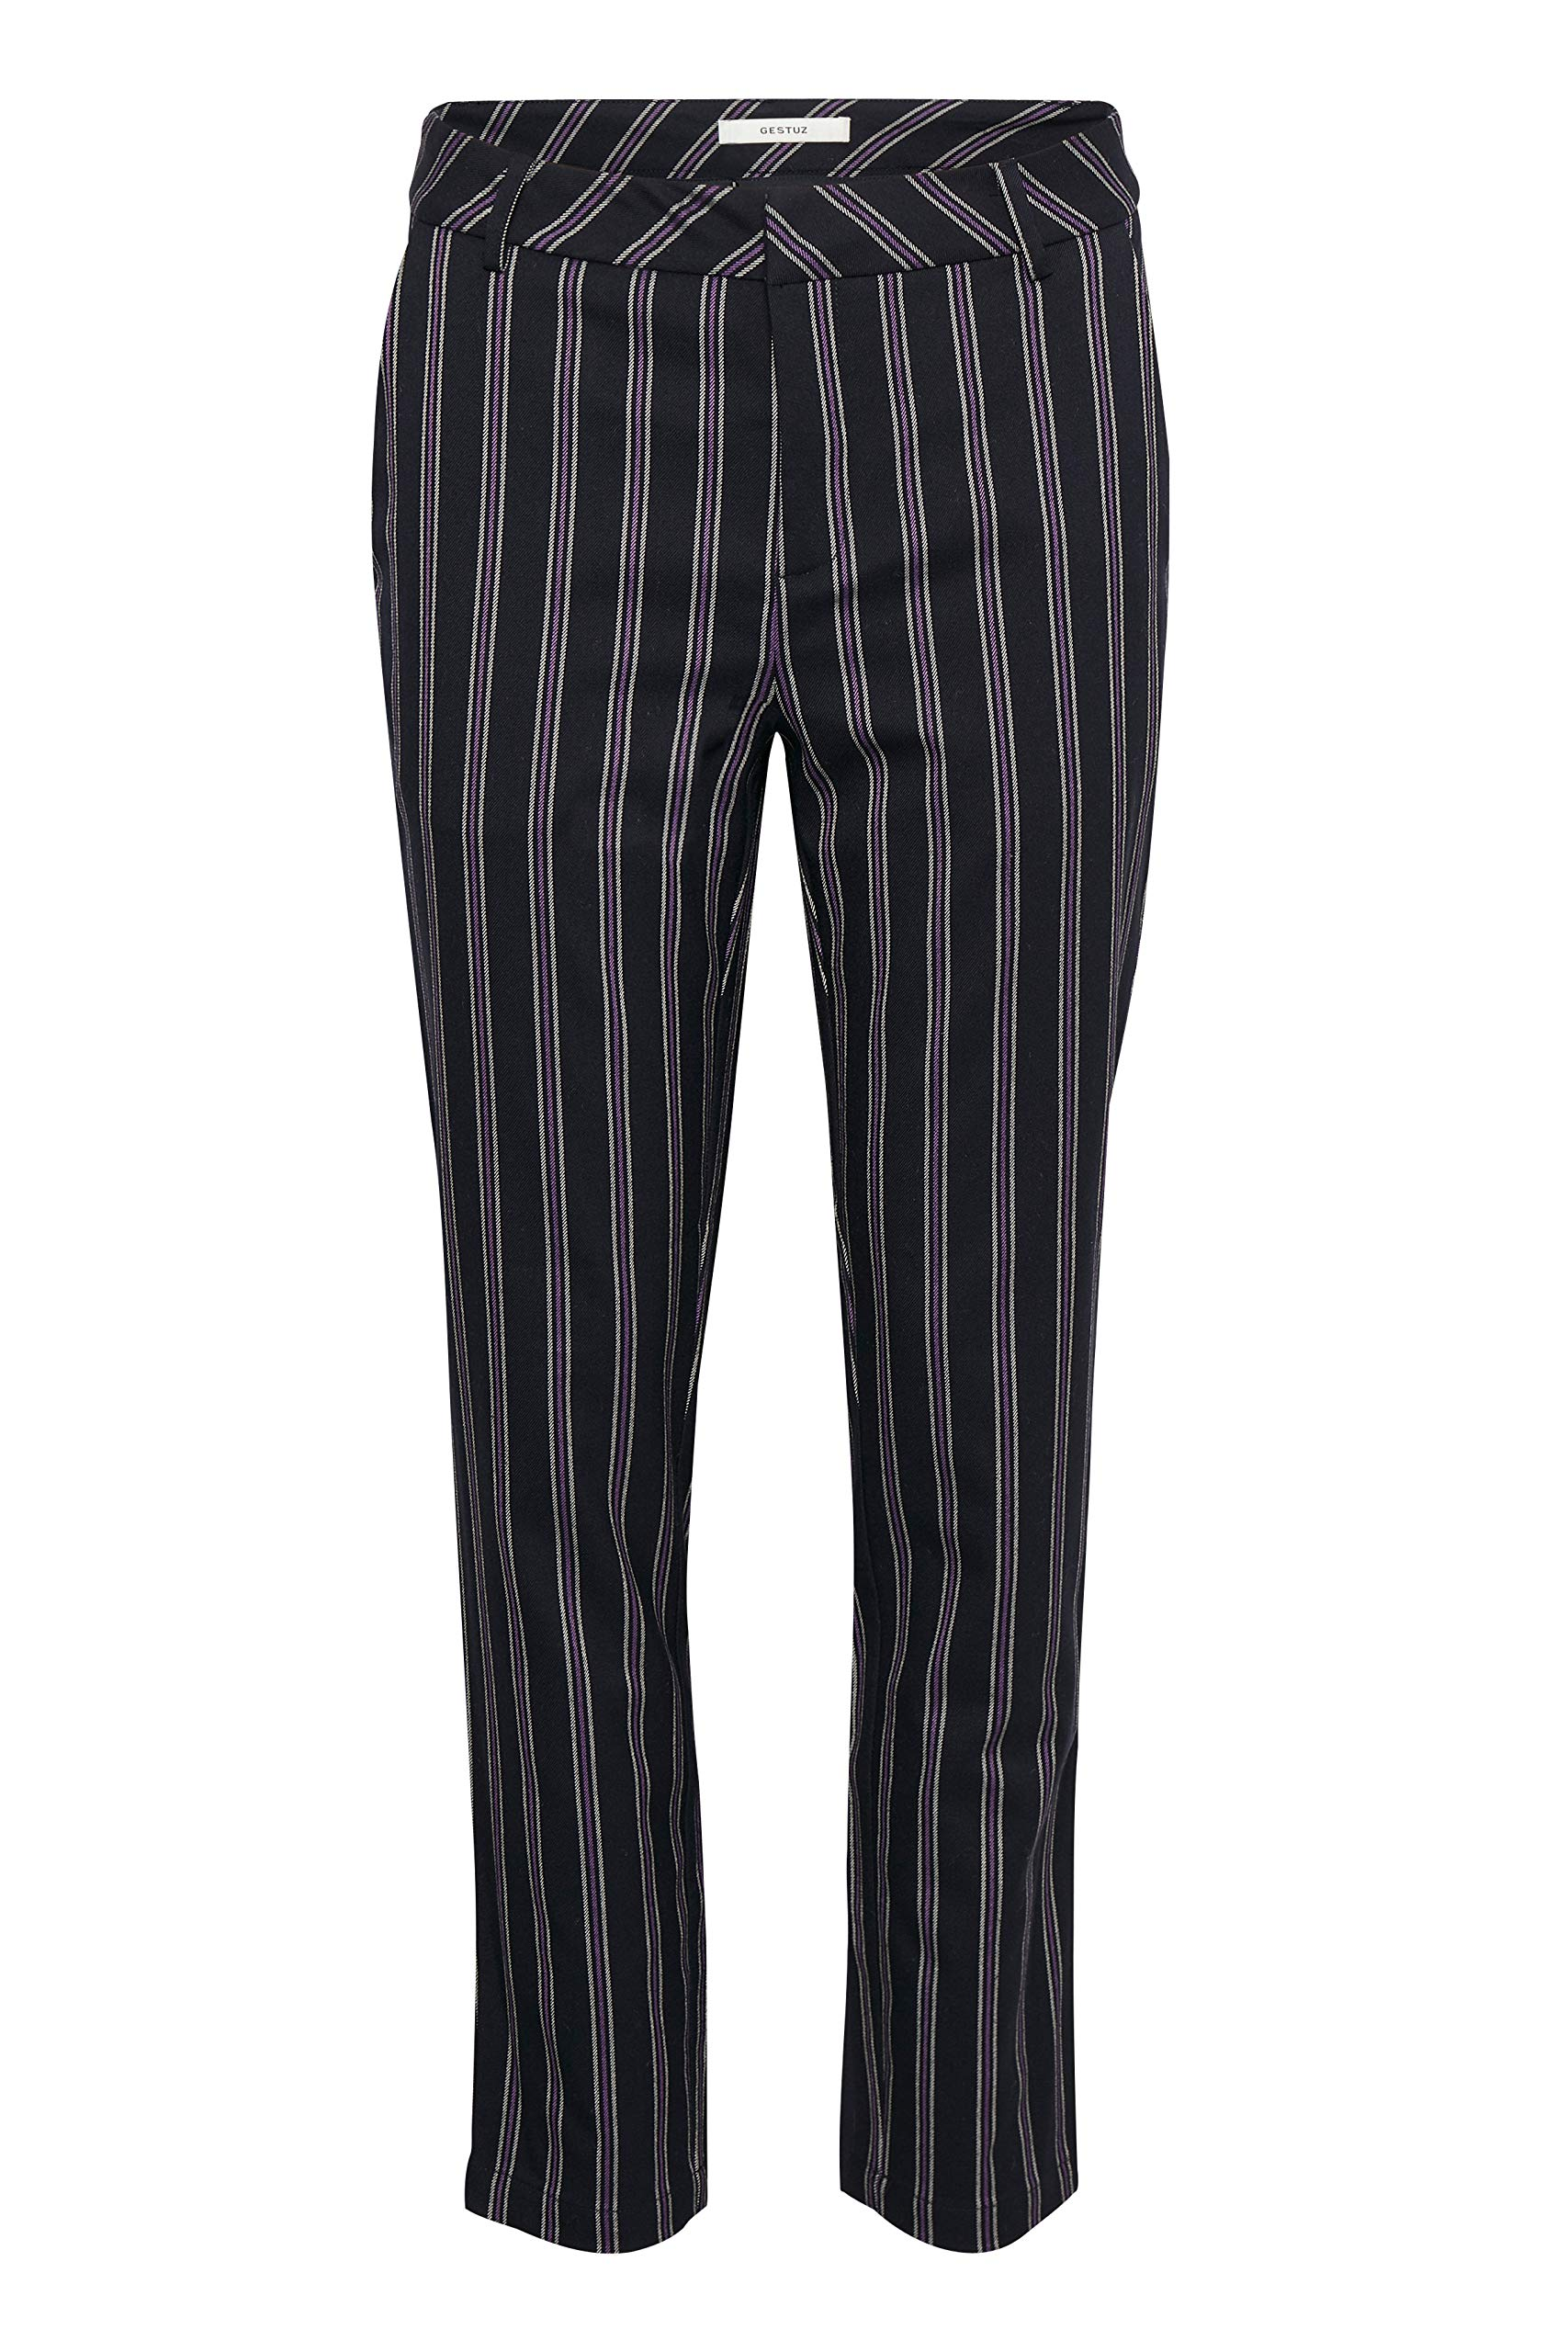 Pants Well Gestuz Fabricant40Femme PantalonNoirdeep 90128W30 Stripe Catta l32taille OZPkuiXT